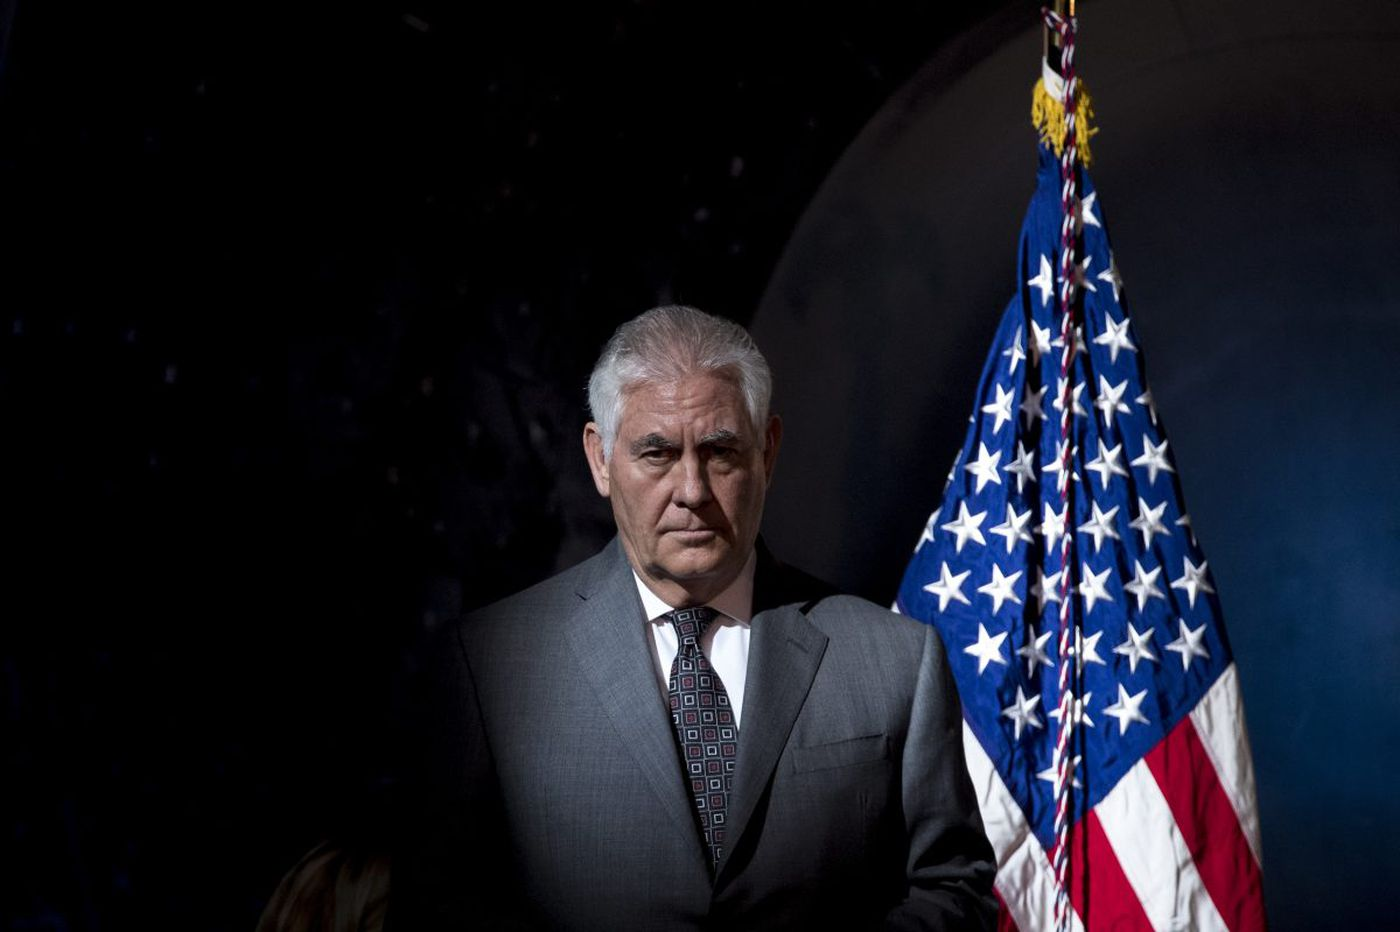 Tillerson is toast. So is U.S. diplomacy.